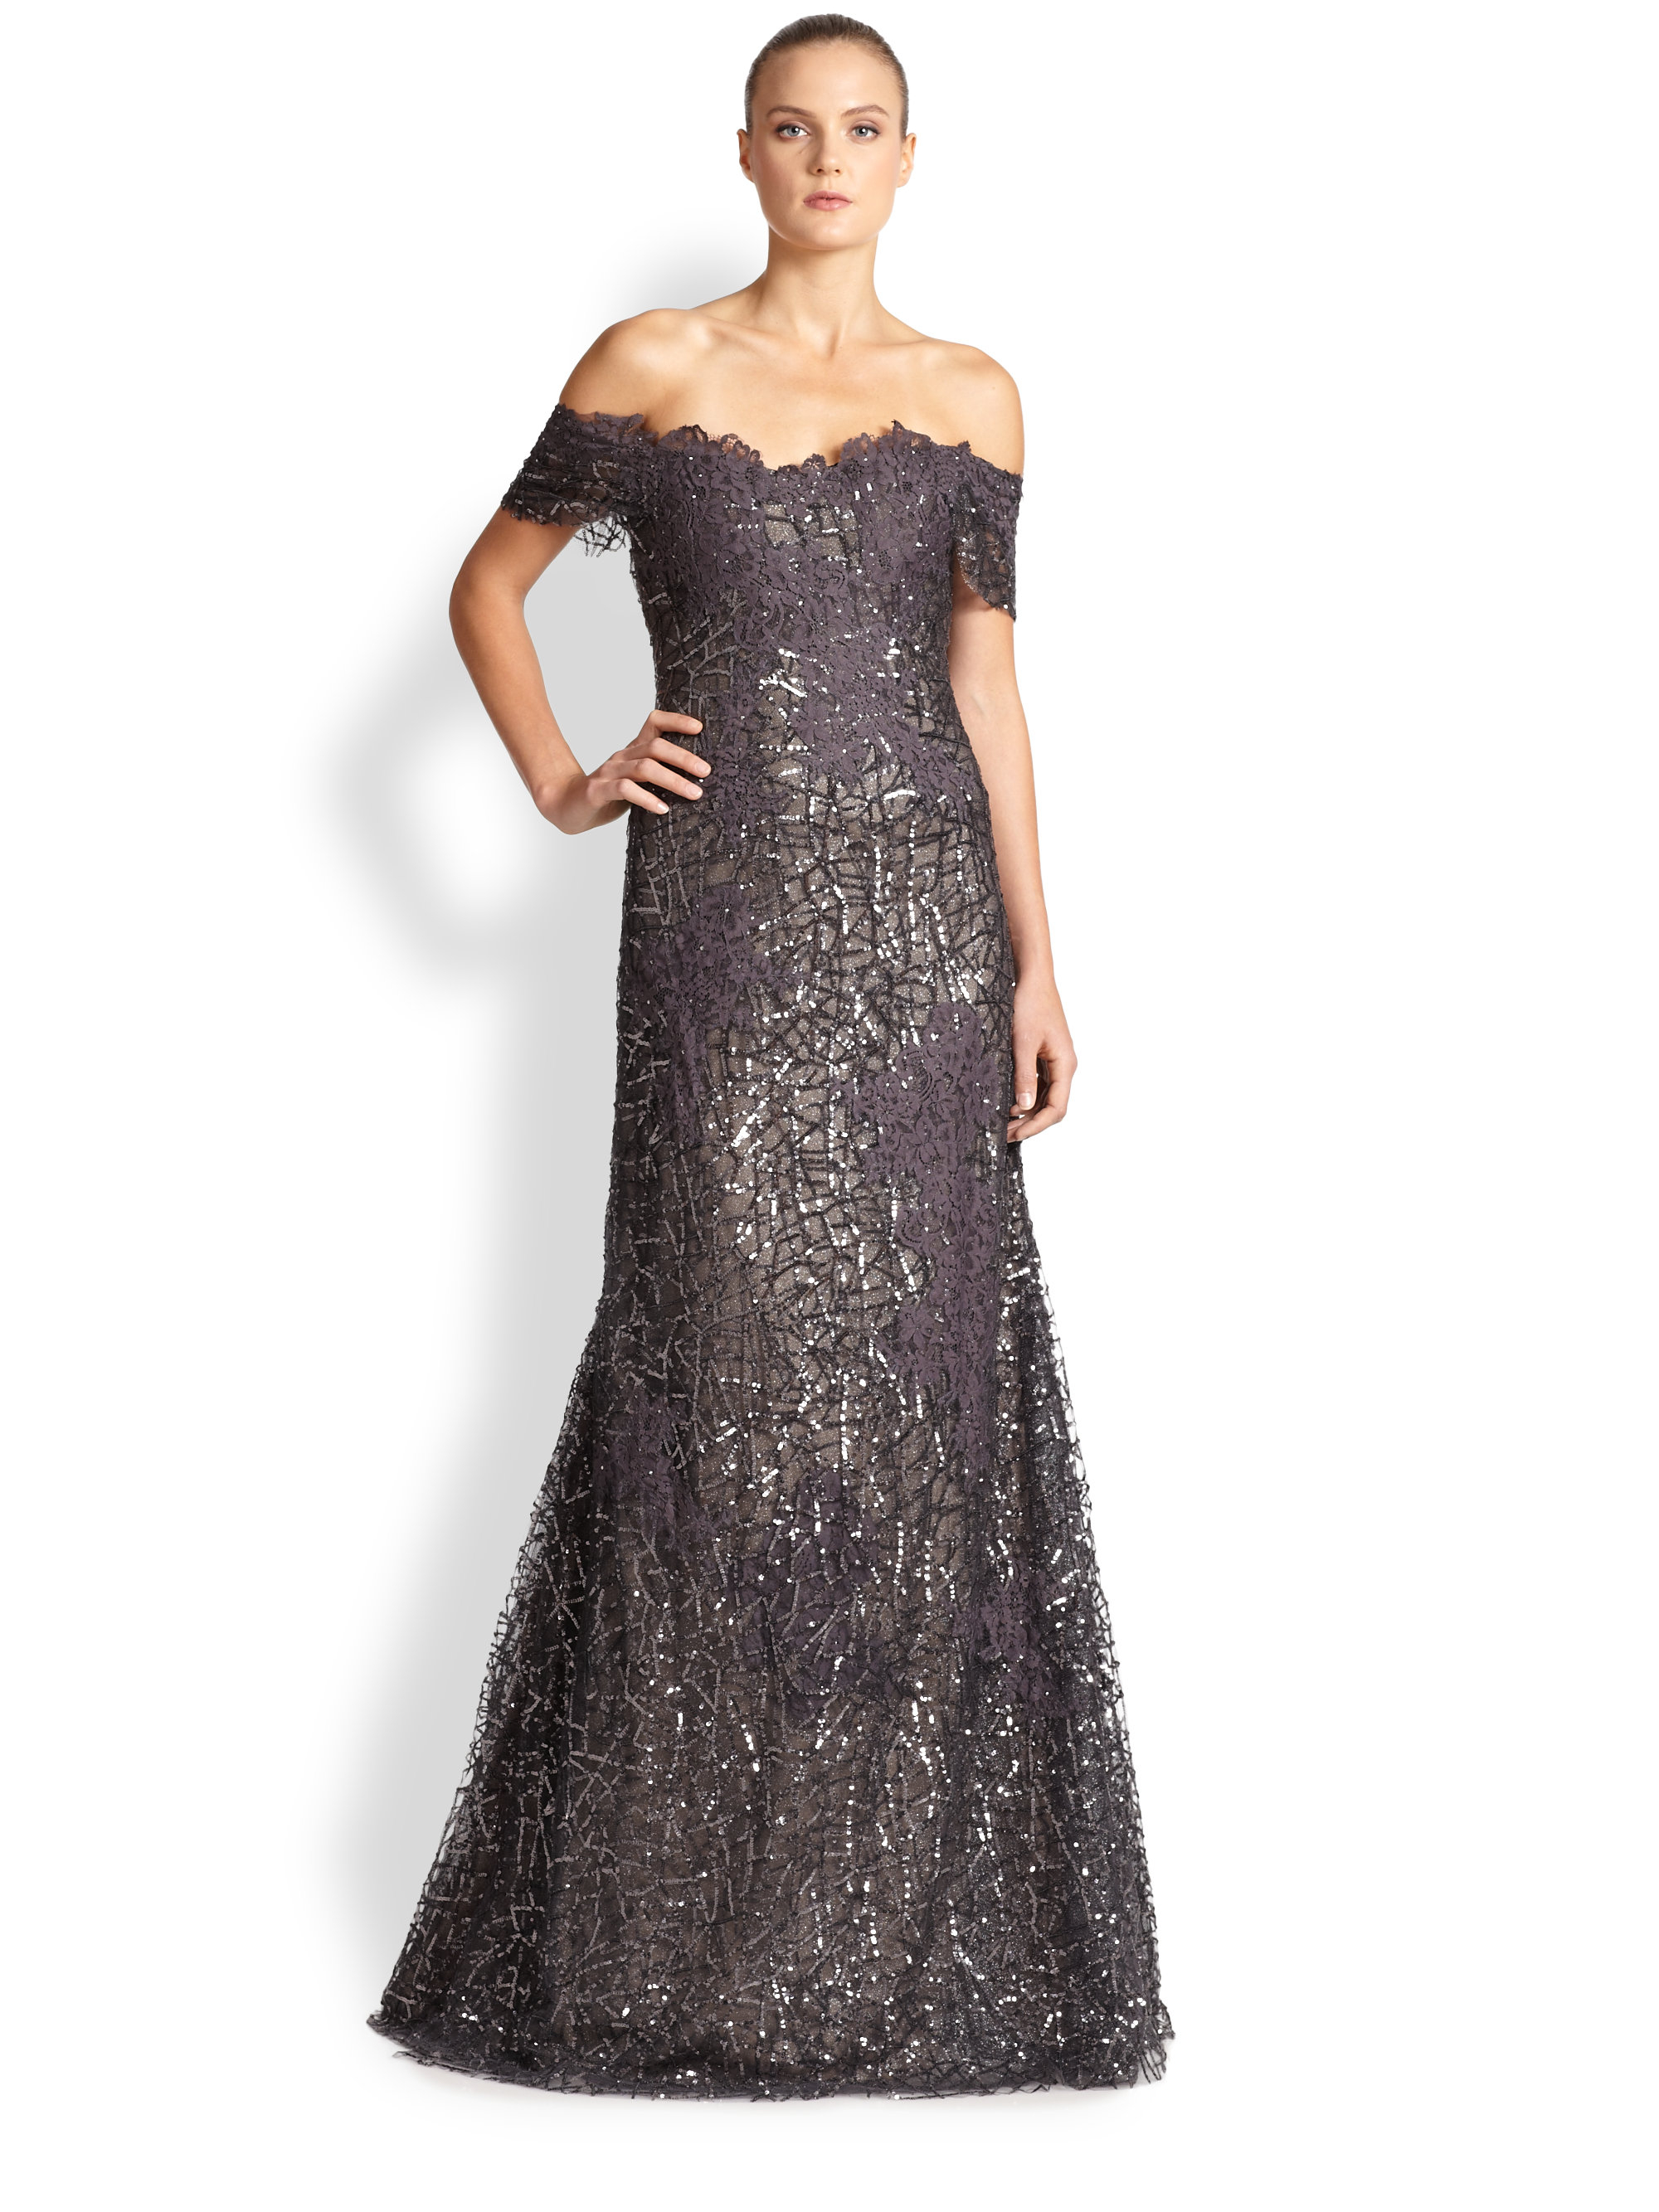 Rene ruiz Sequined Lace Off-the-shoulder Gown in Metallic ... - photo#45